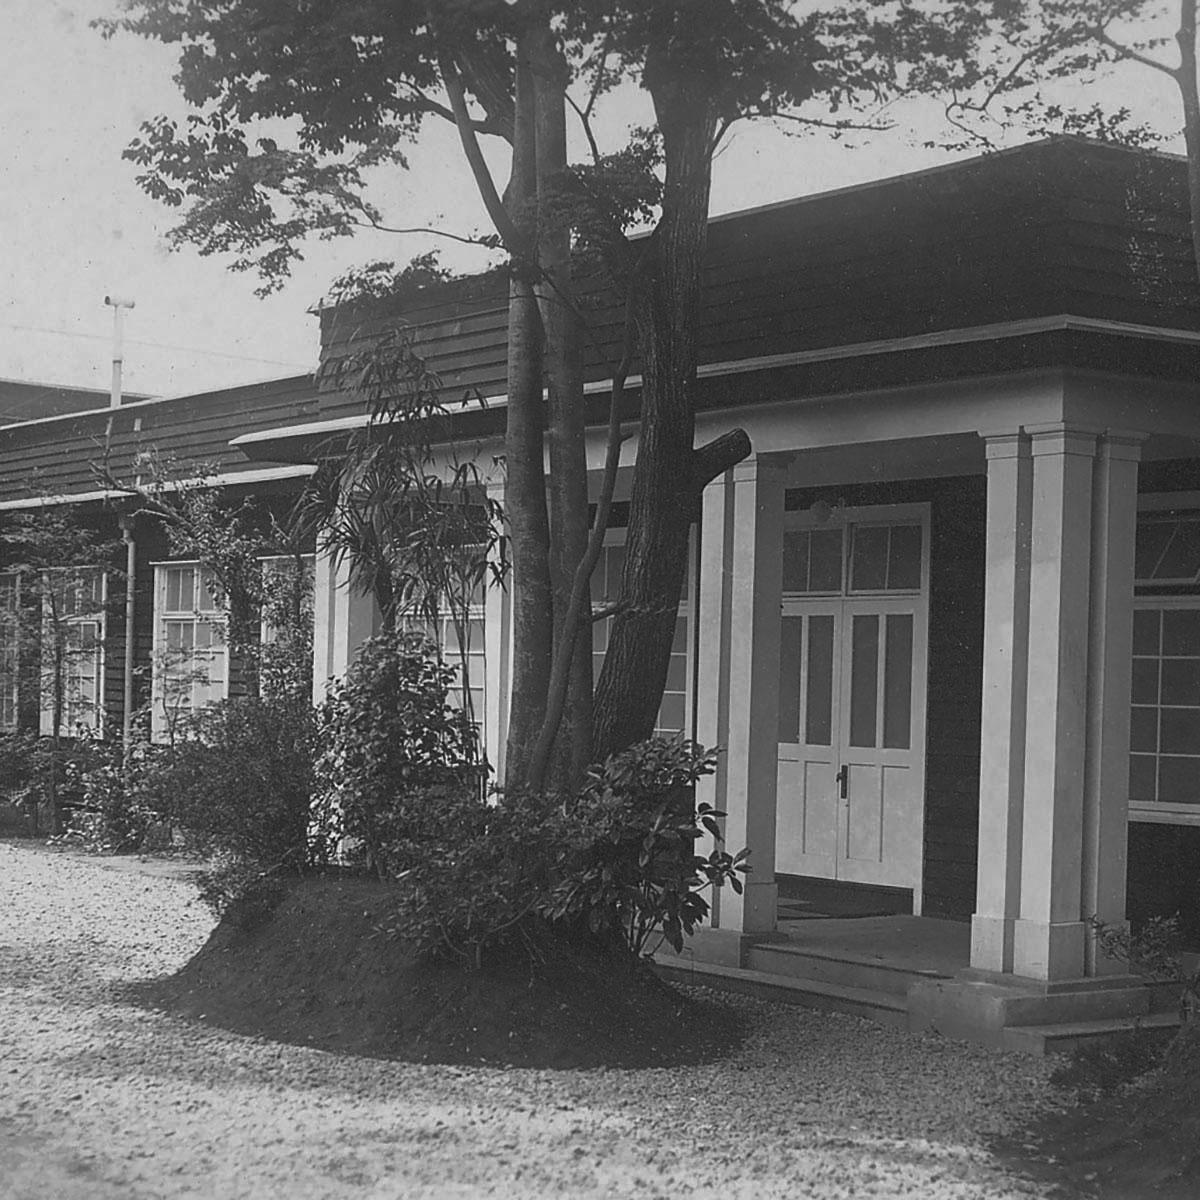 ASIJ Nakameguro Campus from 1927